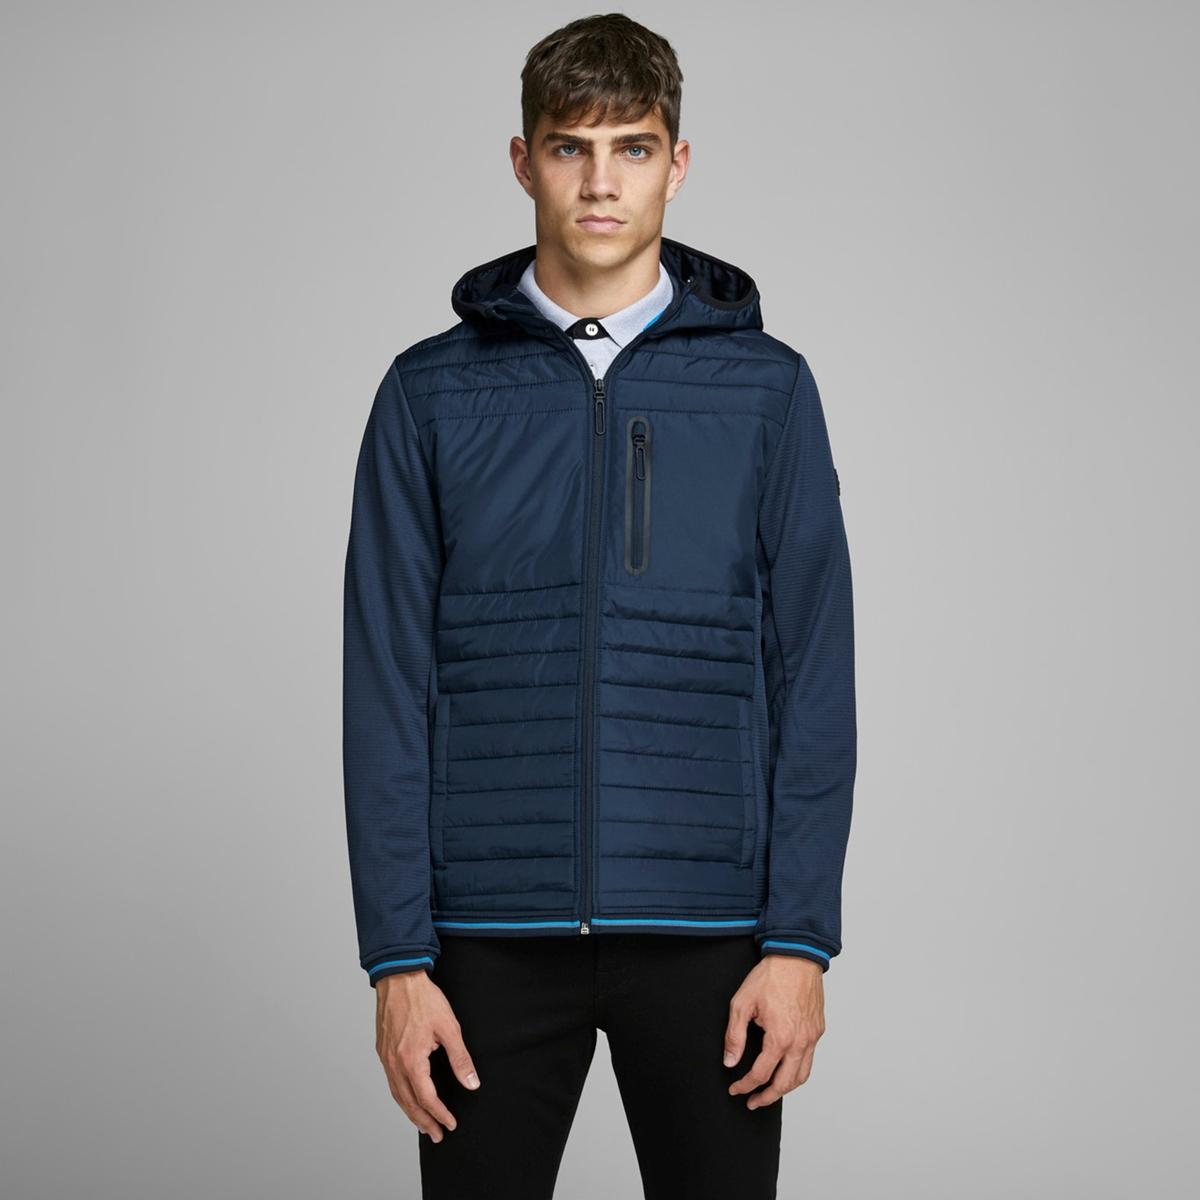 Куртка LaRedoute Стеганая тонкая с капюшоном Jcotripple S синий куртка la redoute стеганая на молнии с капюшоном idaho 2 3xl синий